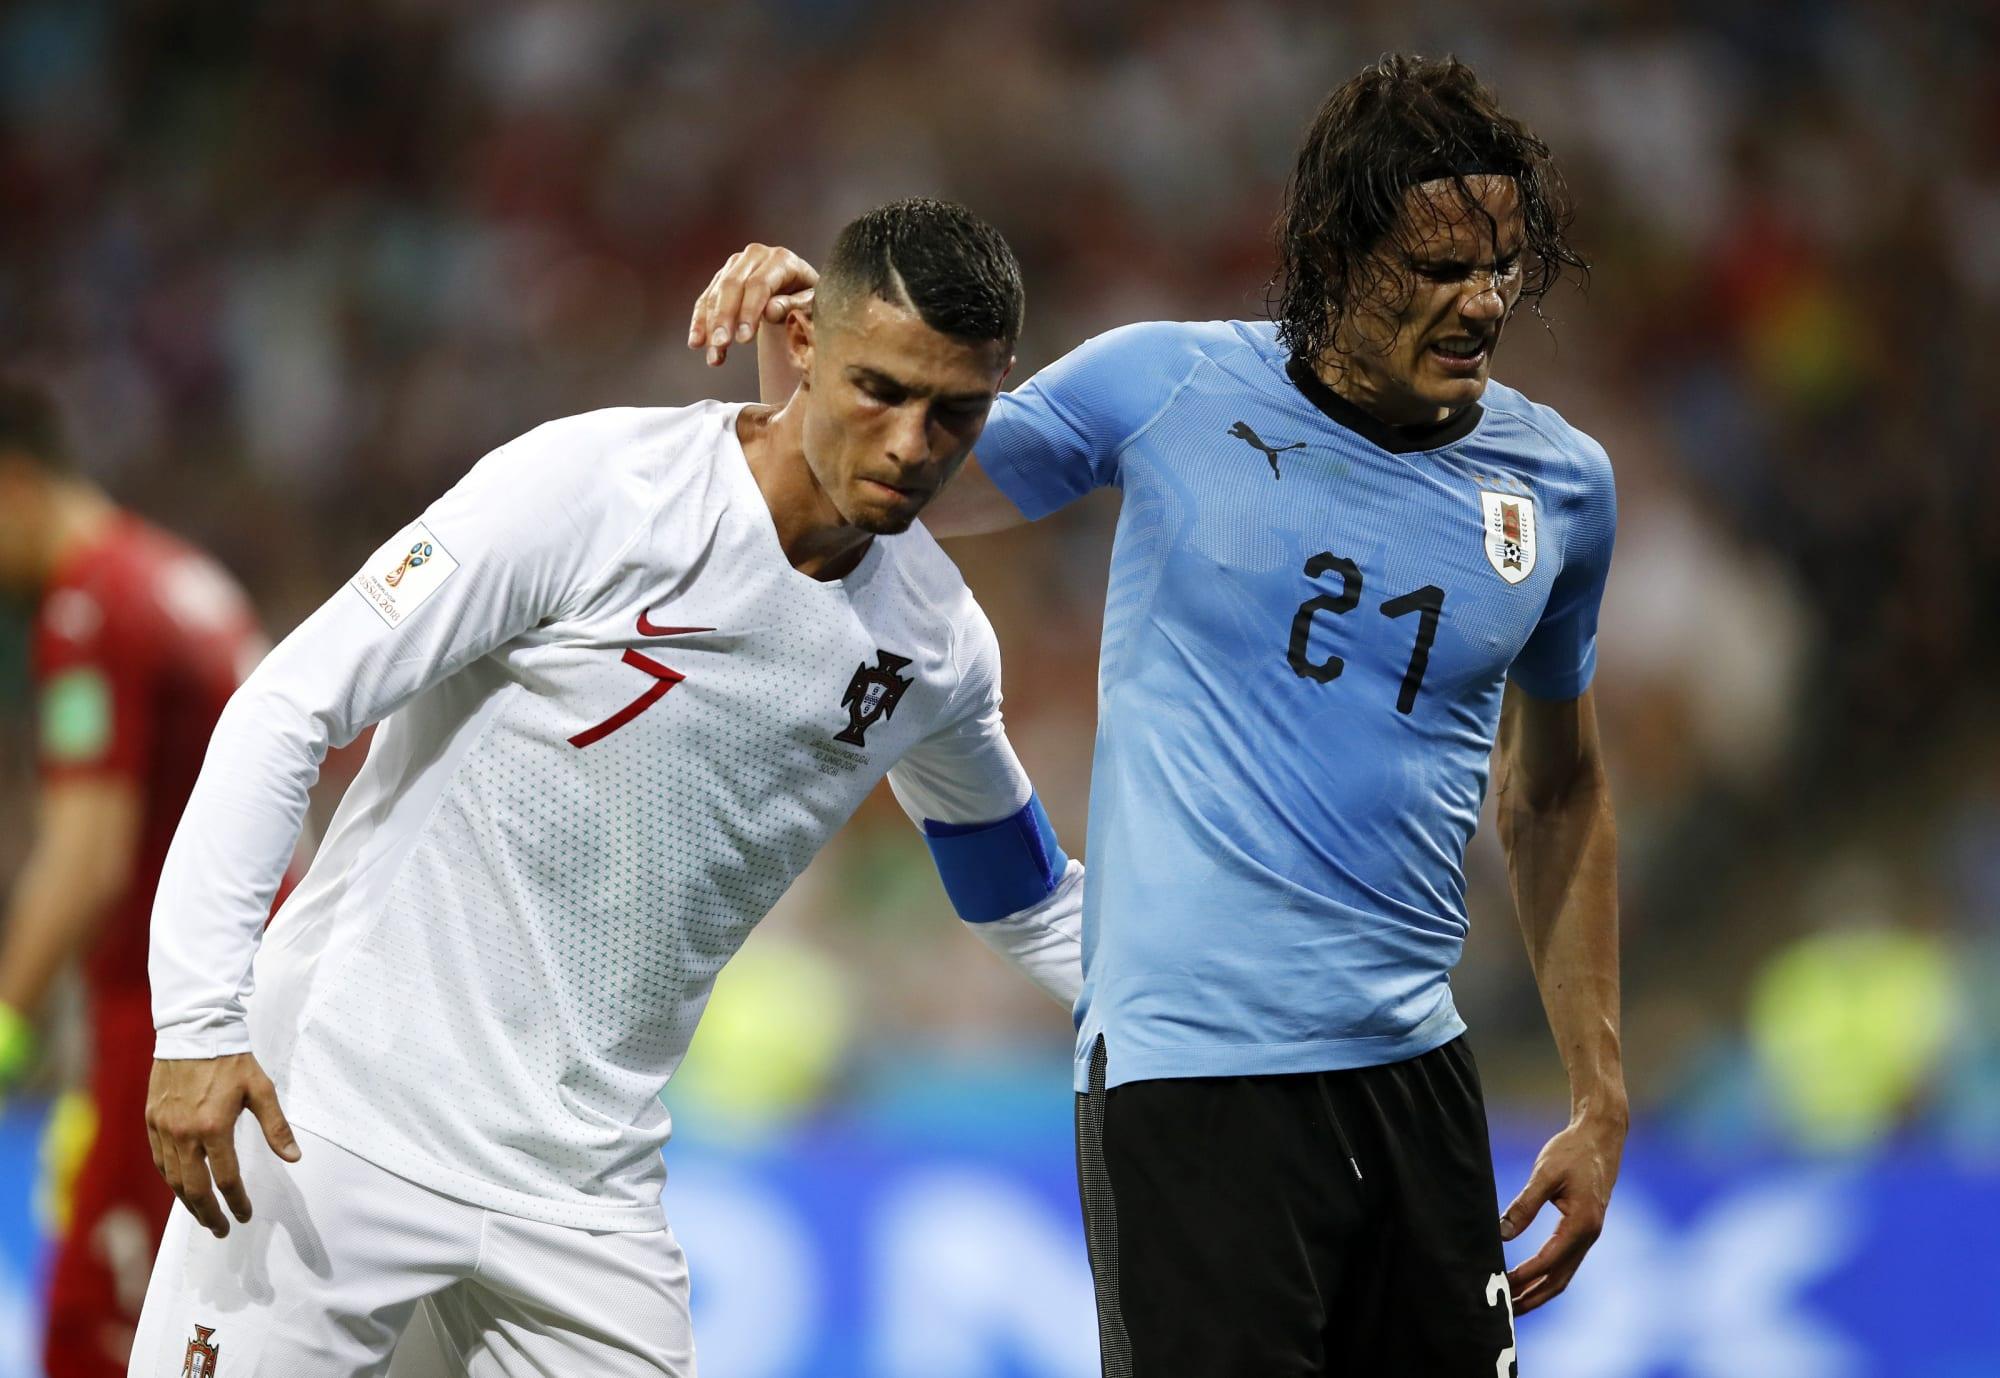 Cavani's stance on Ronaldo's presence at Manchester United revealed